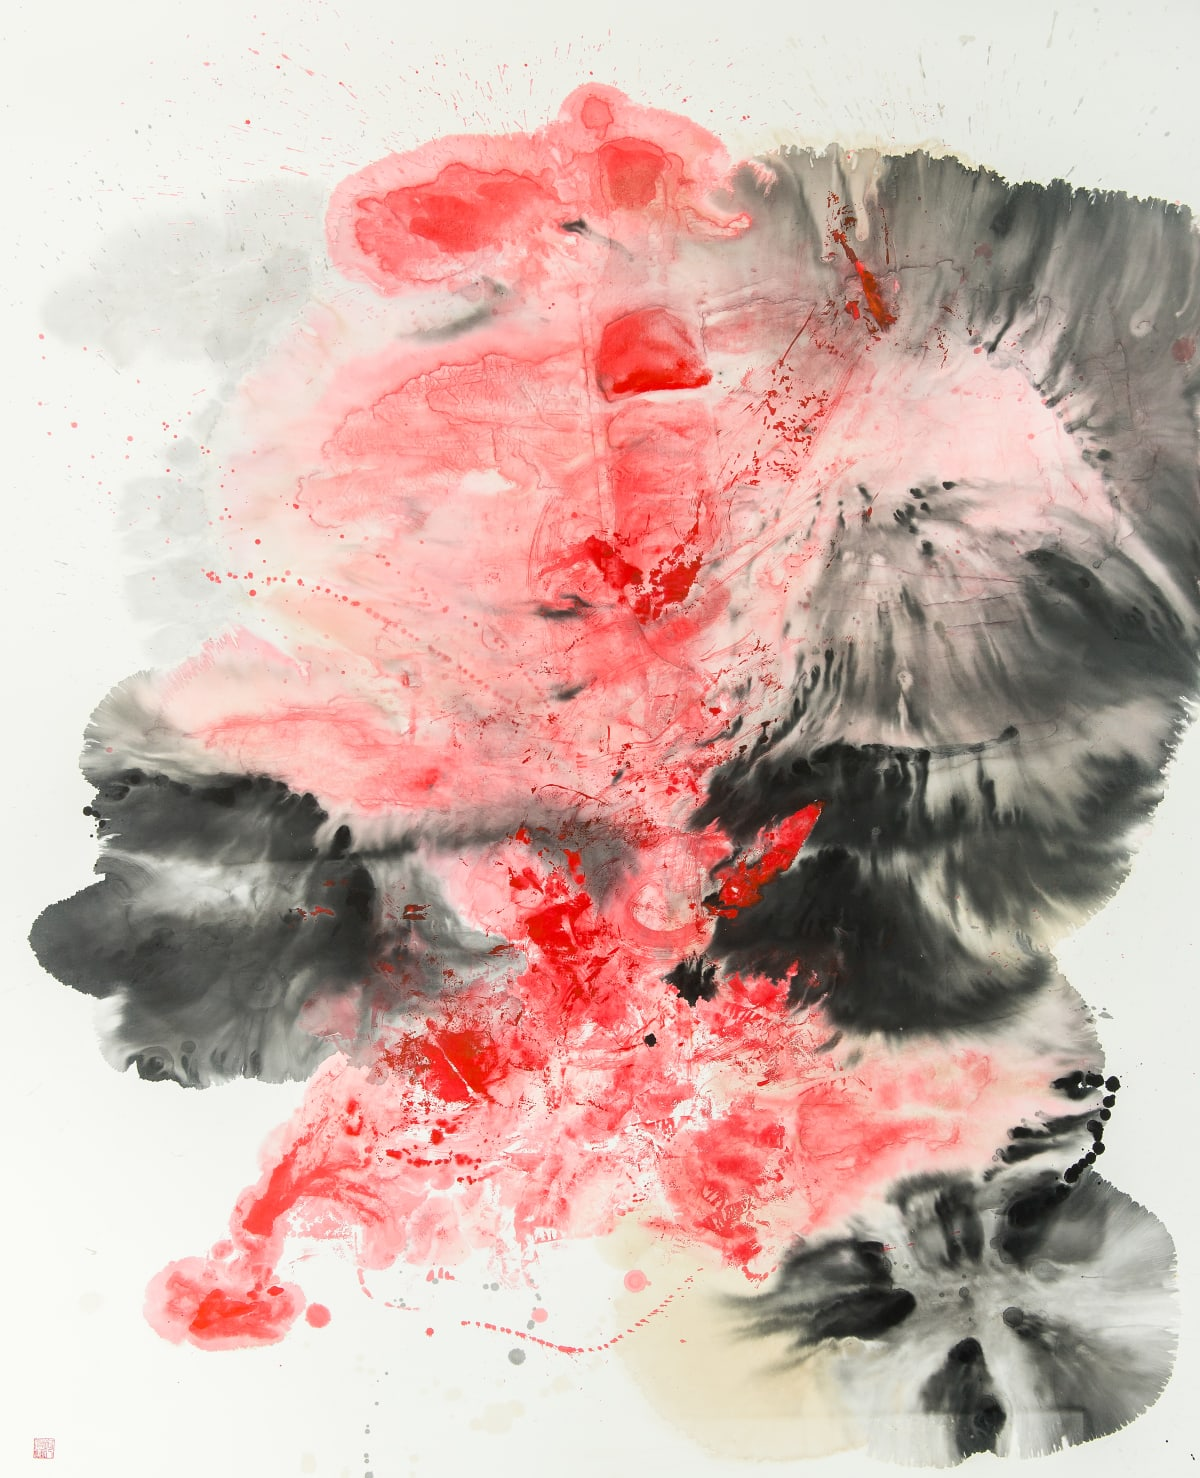 Chloe Ho 何鳳蓮, Ink Eruption, 2017